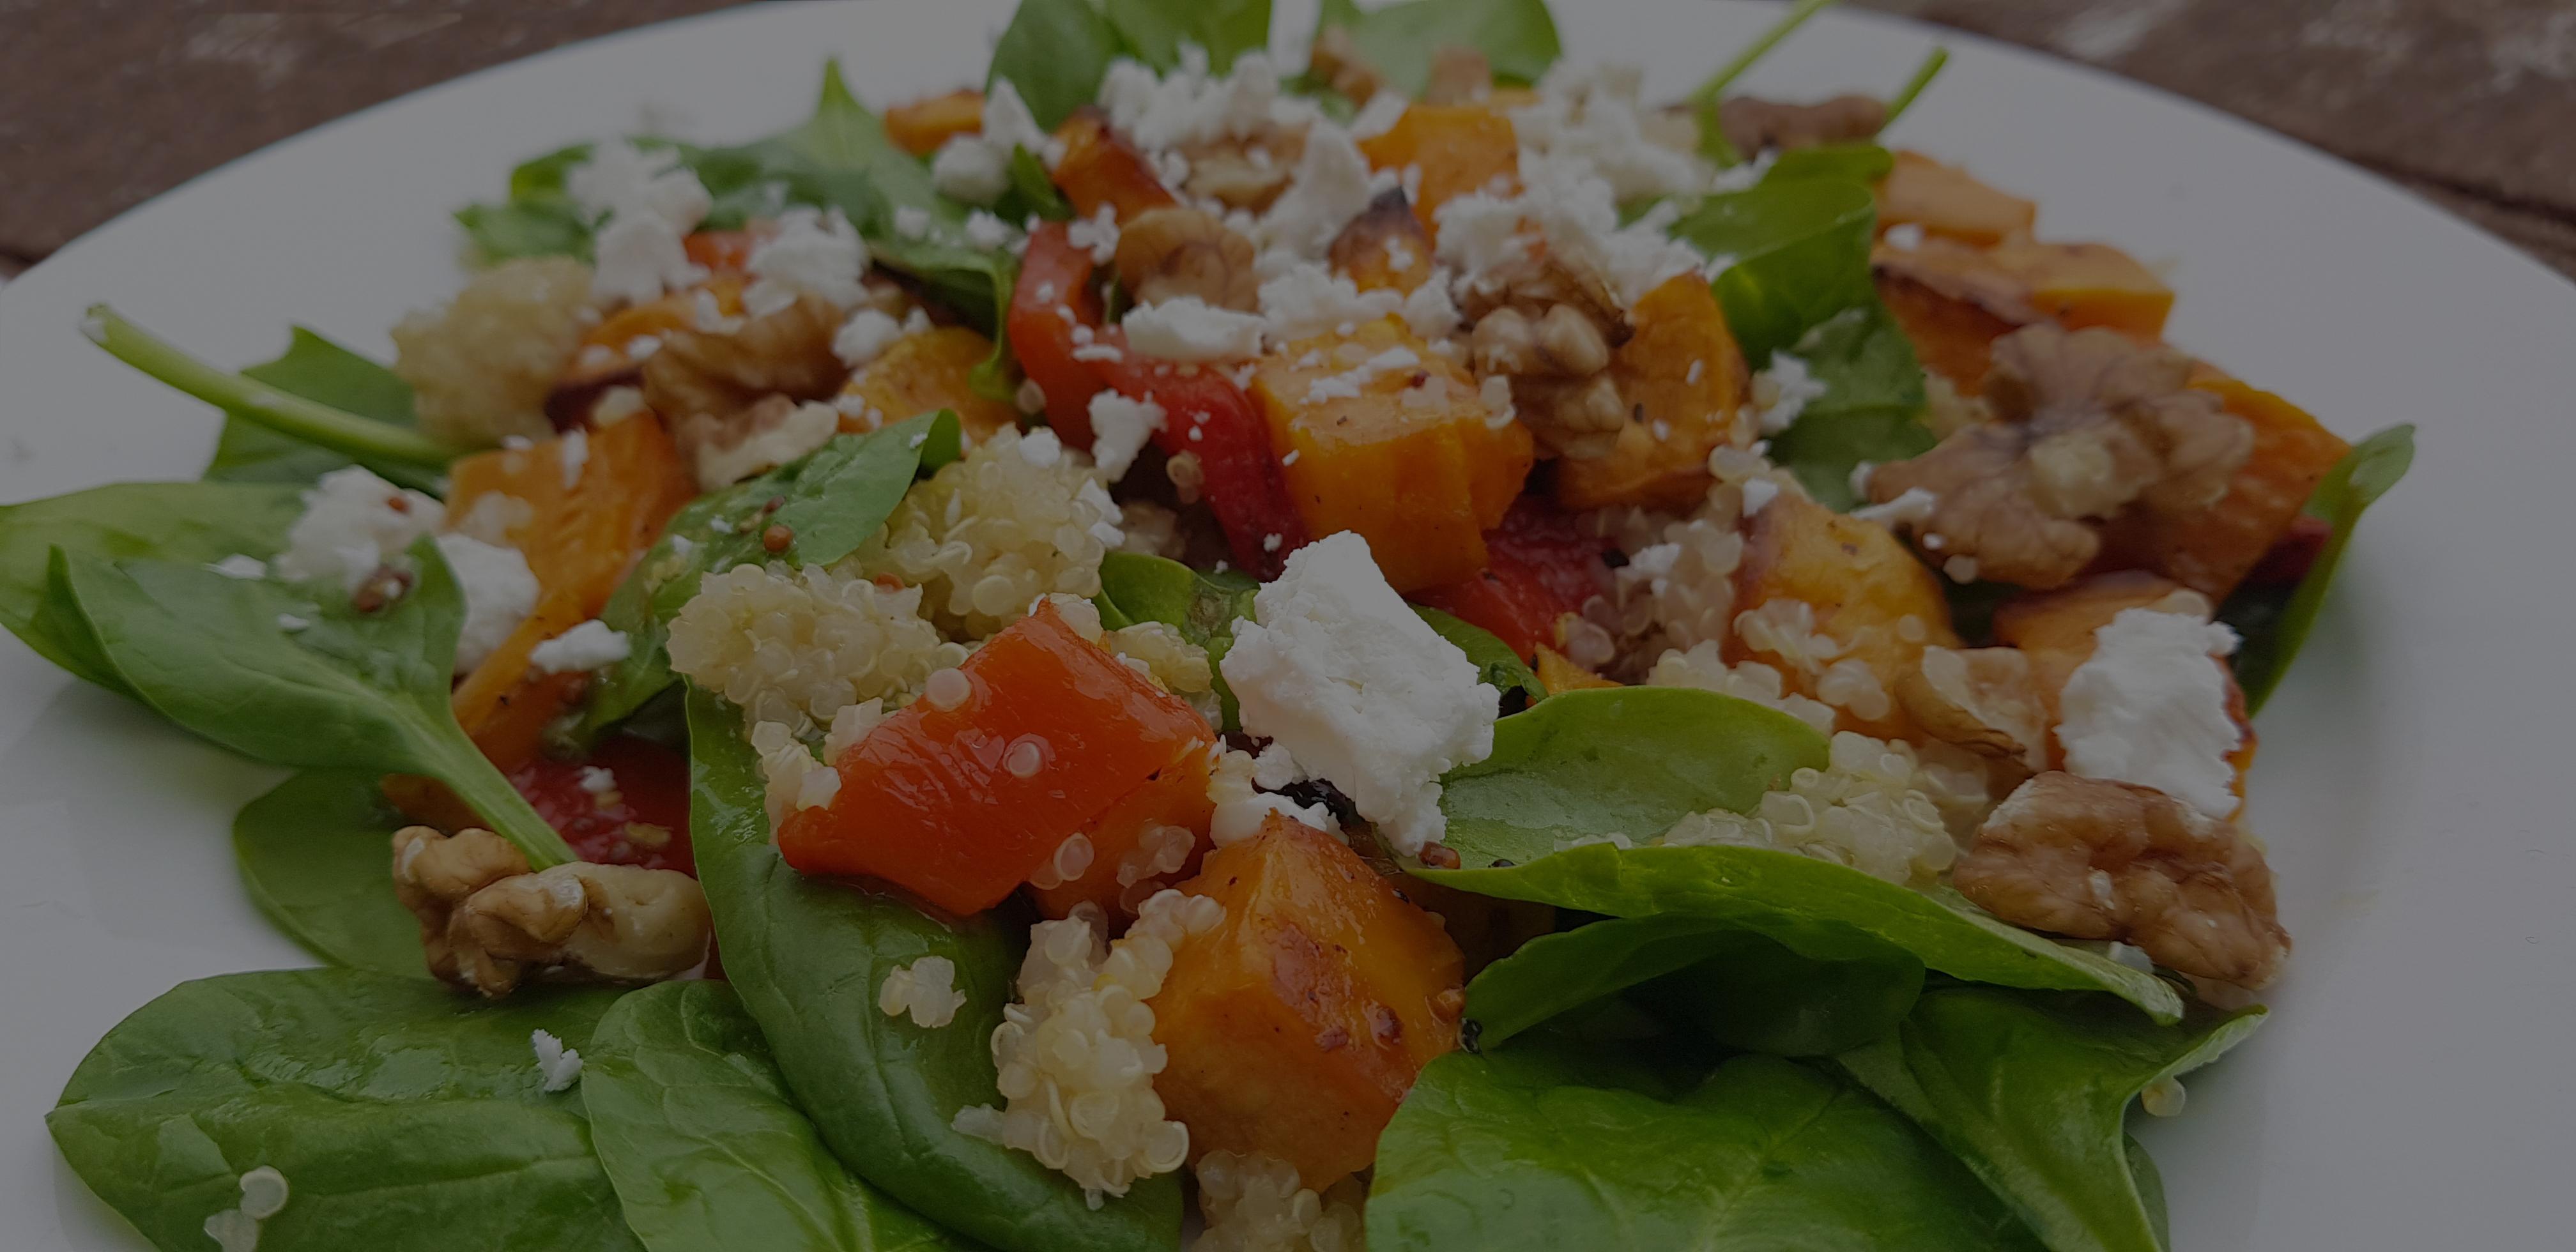 Low-FODMAP sweet potato and quinoa salad